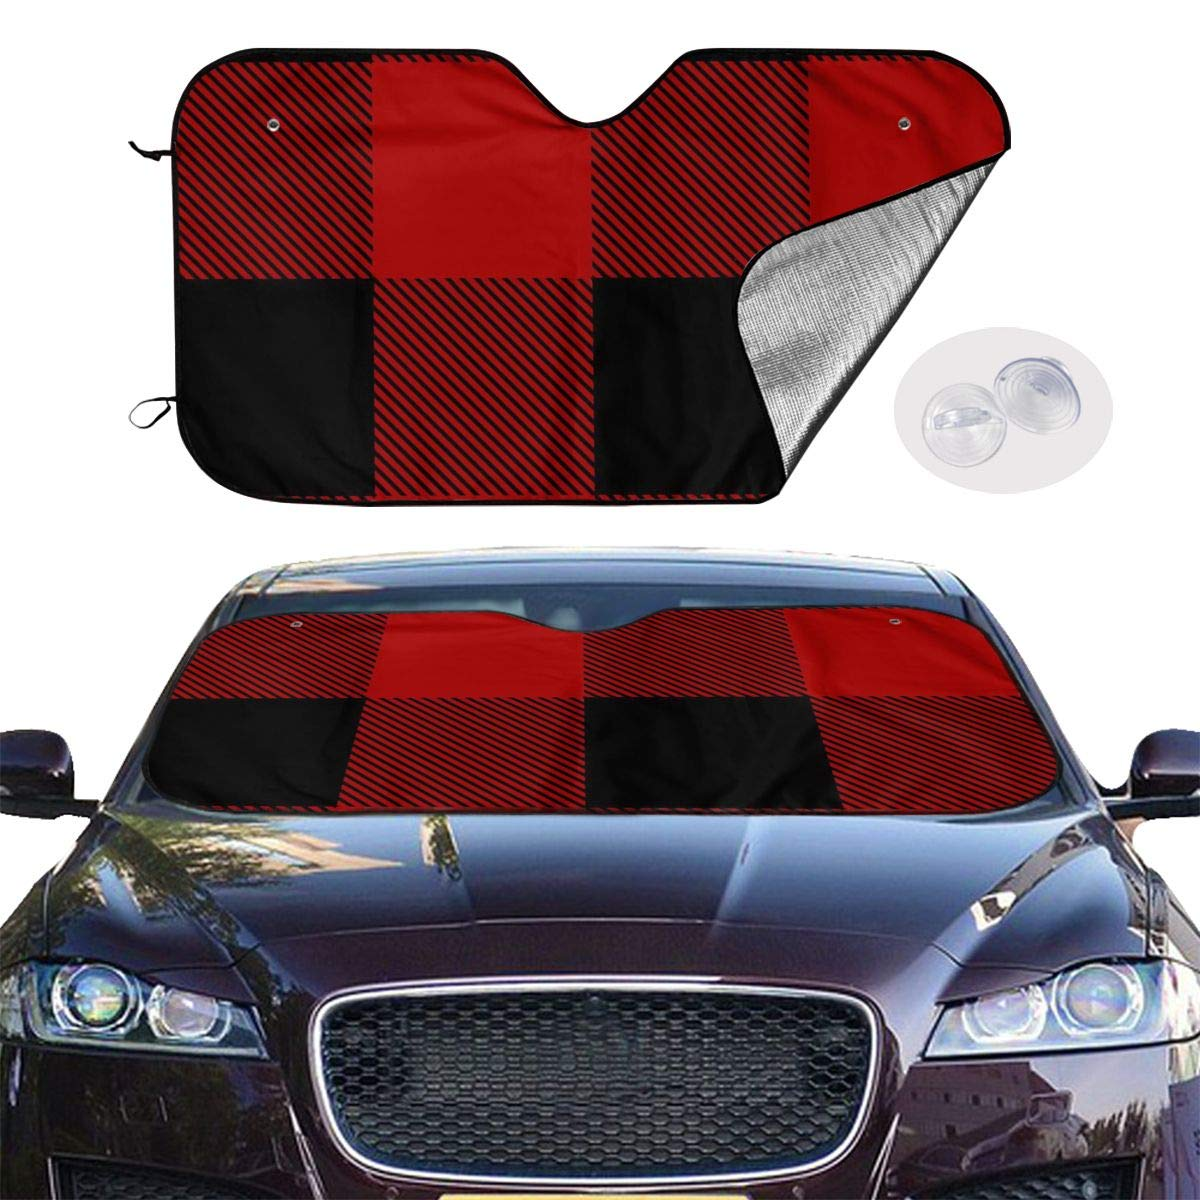 Red Tartan Car Sunshade Window Windscreen Cover,Automotive Window Protector Sunshade Uv Sun and Heat Reflector for Car Truck SUV,Keep Your Vehicle Cool and Damage Free